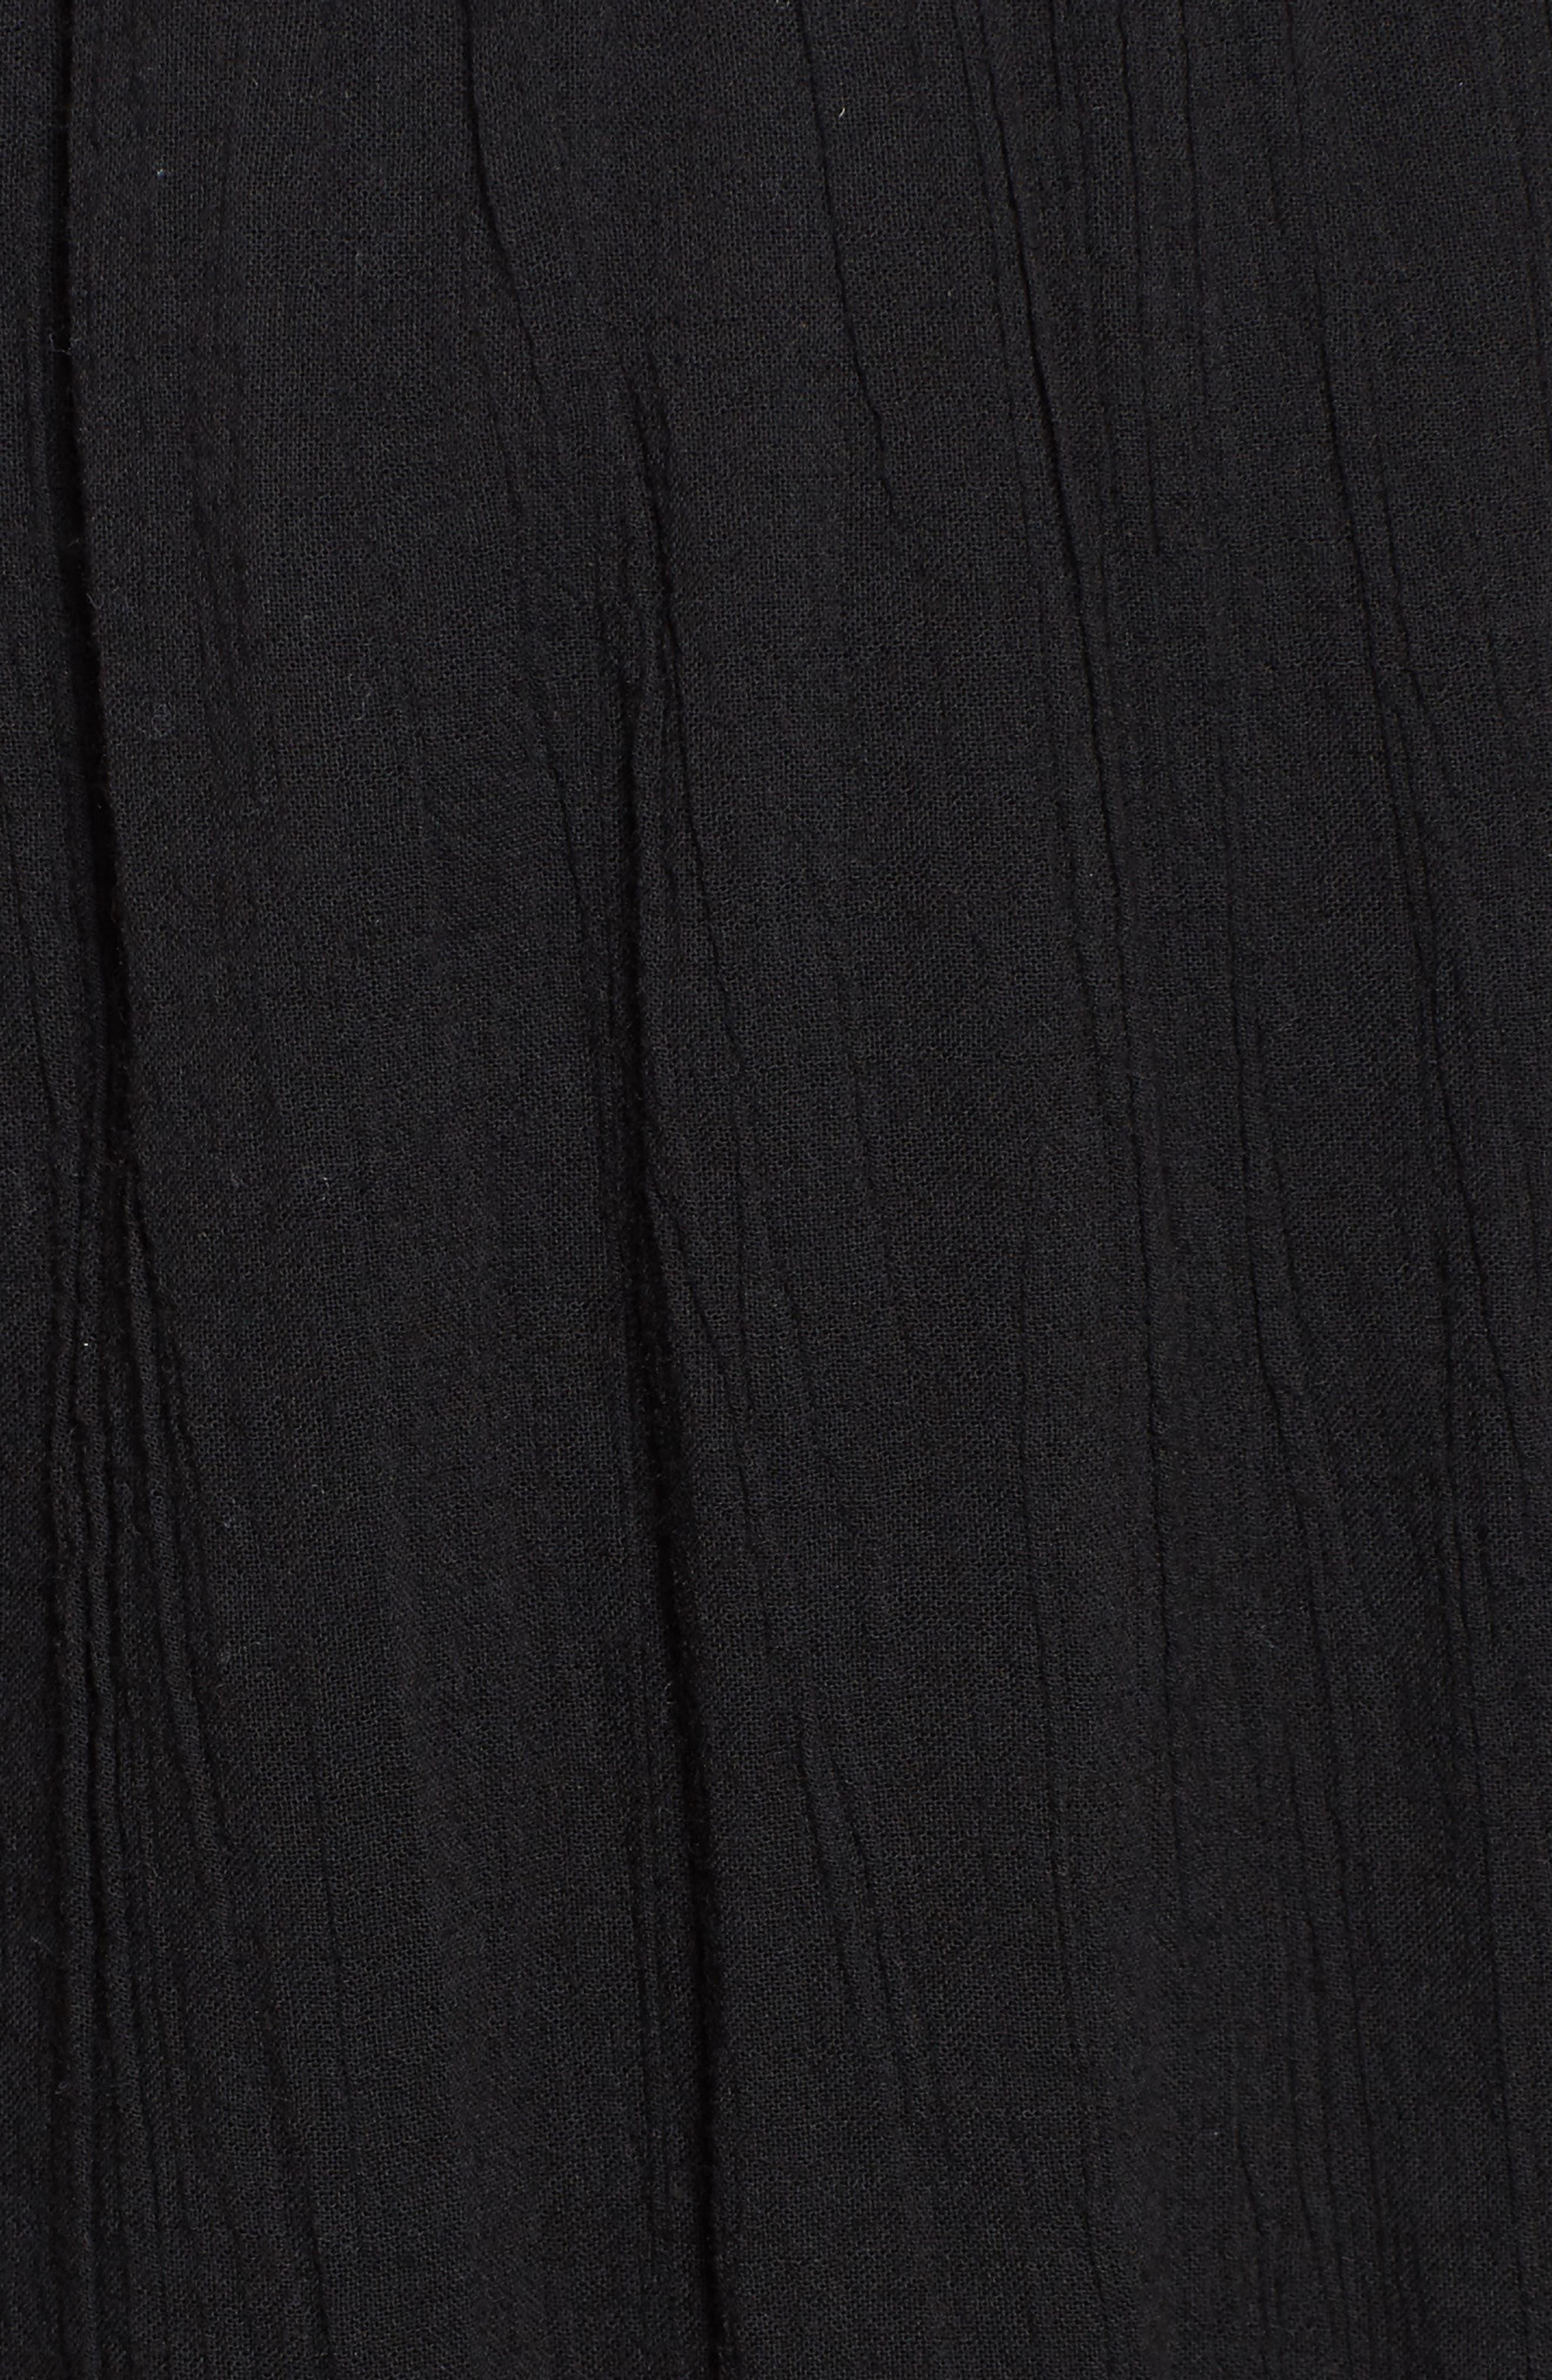 Gauze Midi Skirt,                             Alternate thumbnail 5, color,                             Black